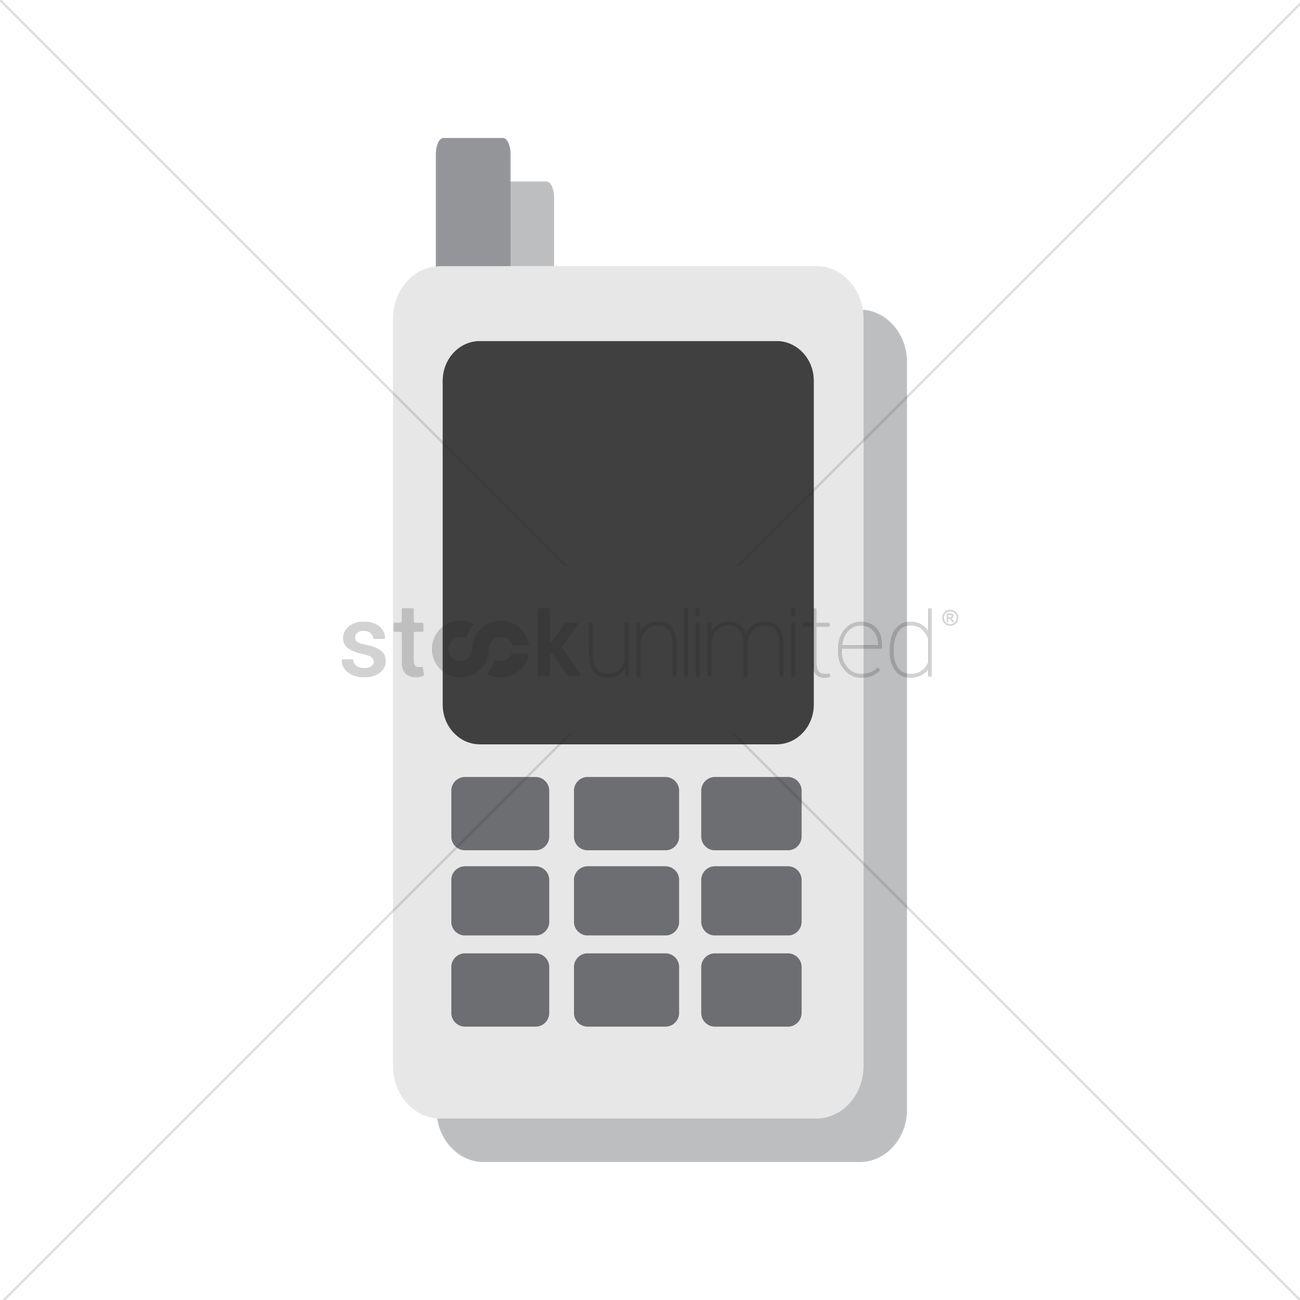 1300x1300 Free Retro Cellphone Vector Image